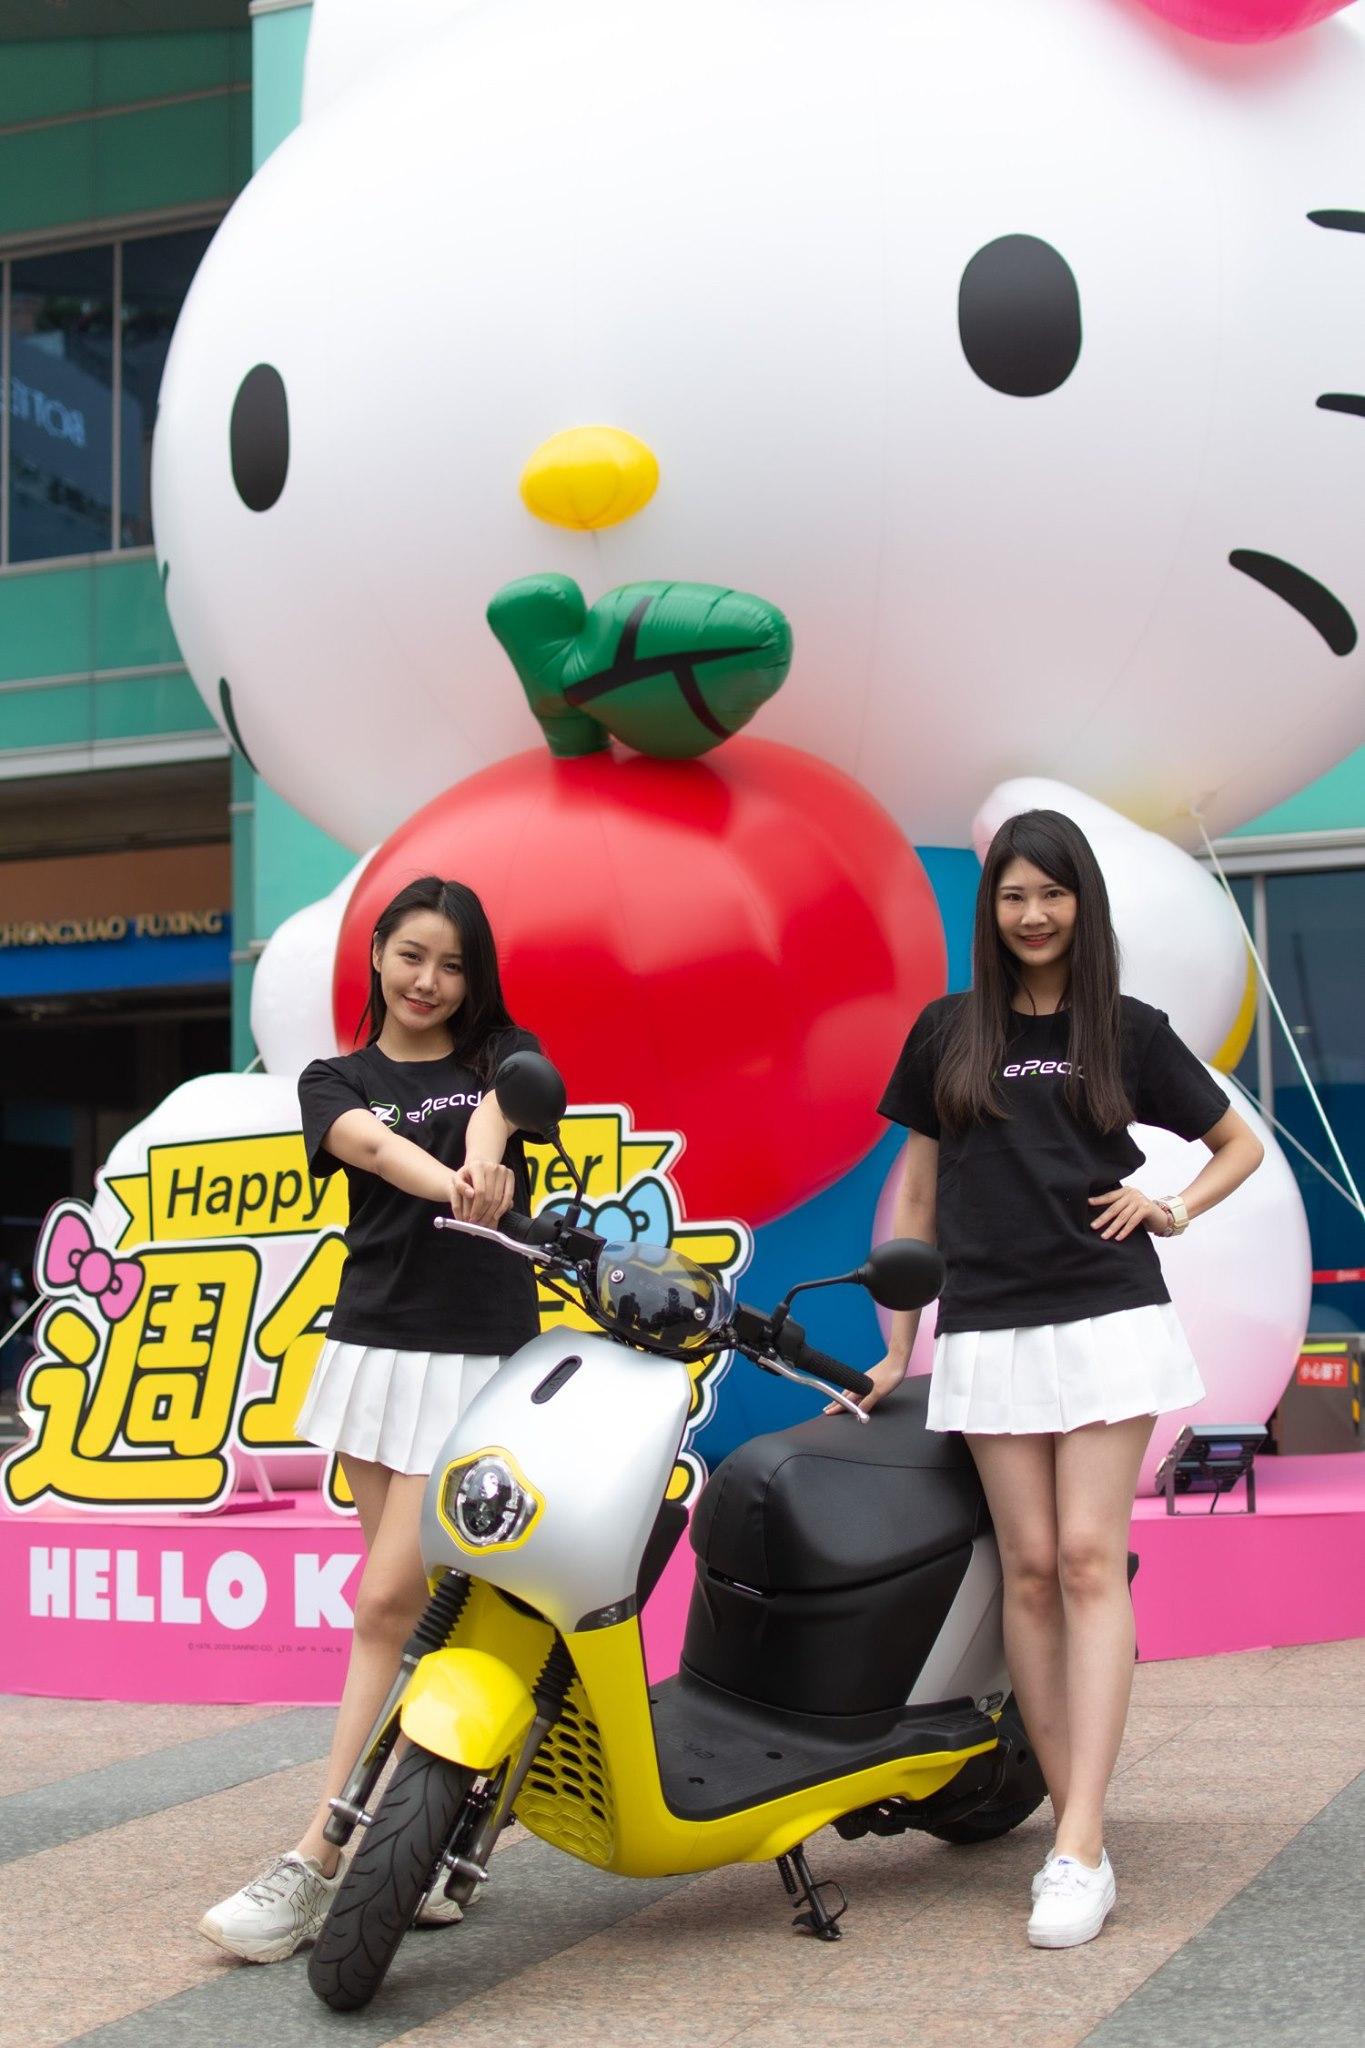 eReady 在 SOGO 周年慶期間於台北復興館舉辦試乘活動。